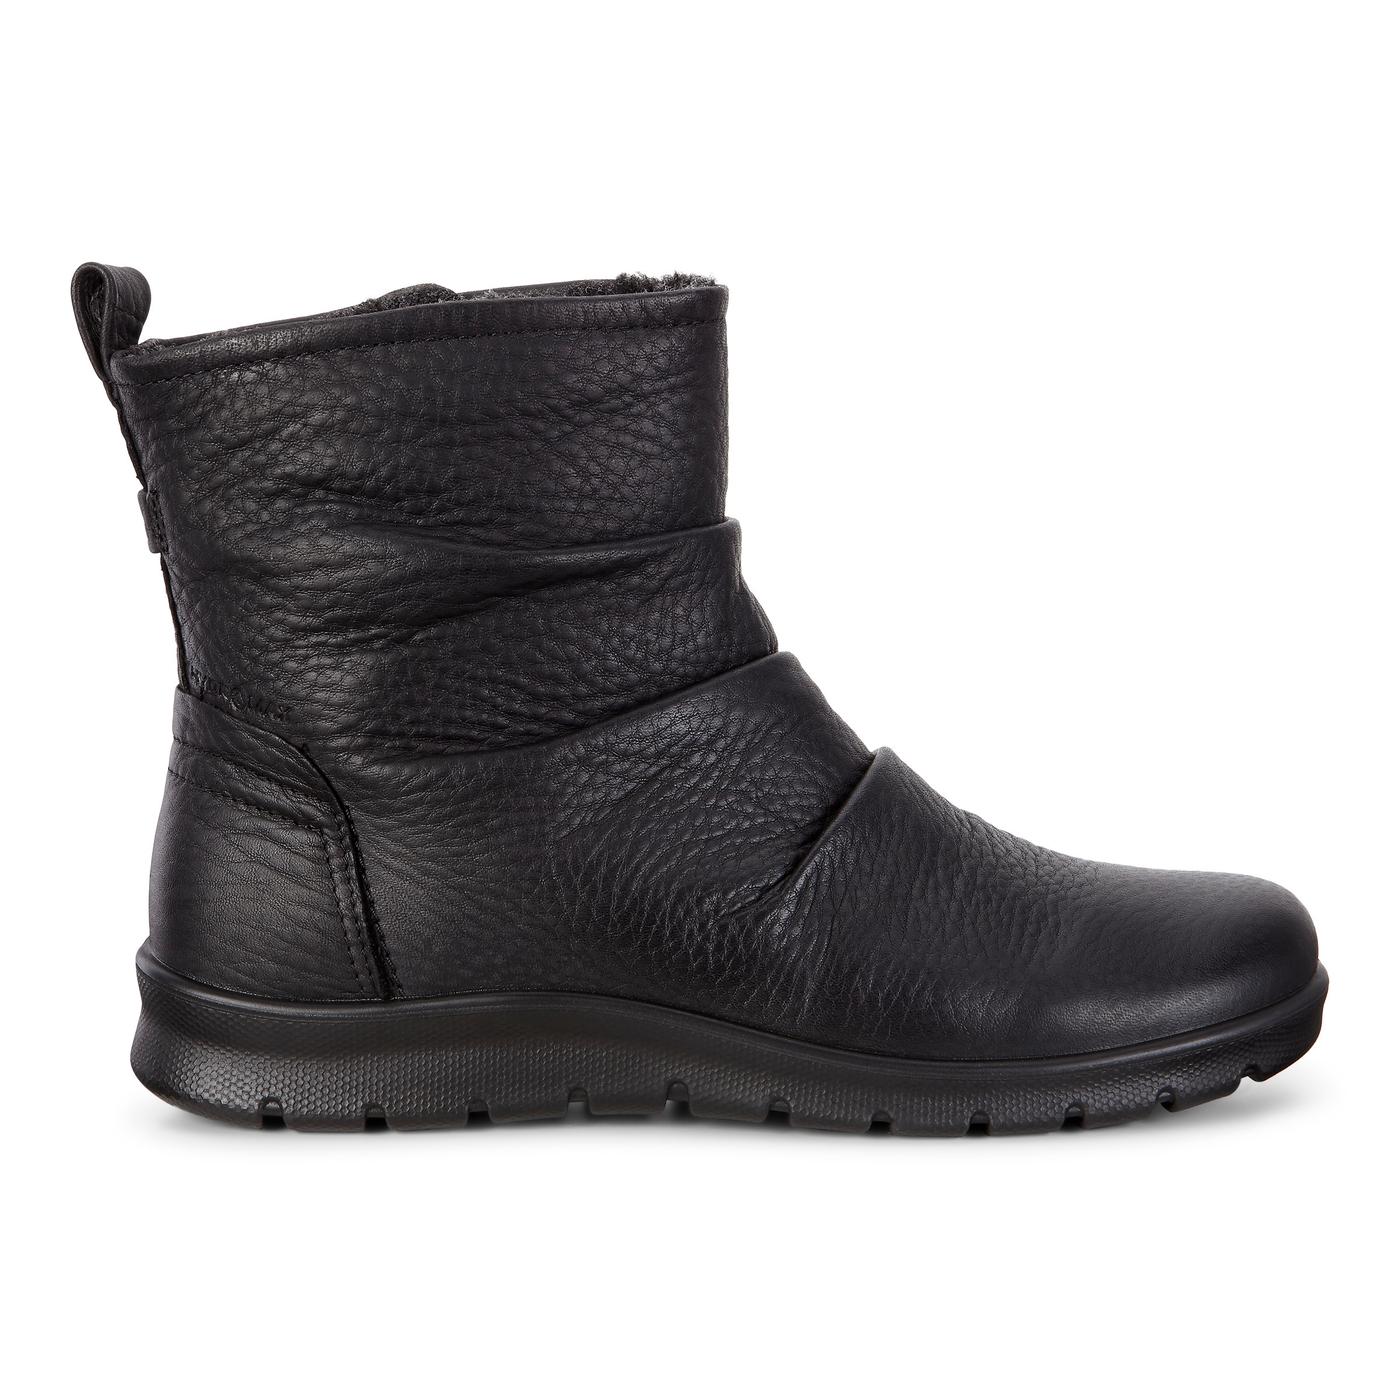 ECCO BABETT BOOT Ankle Boot HM